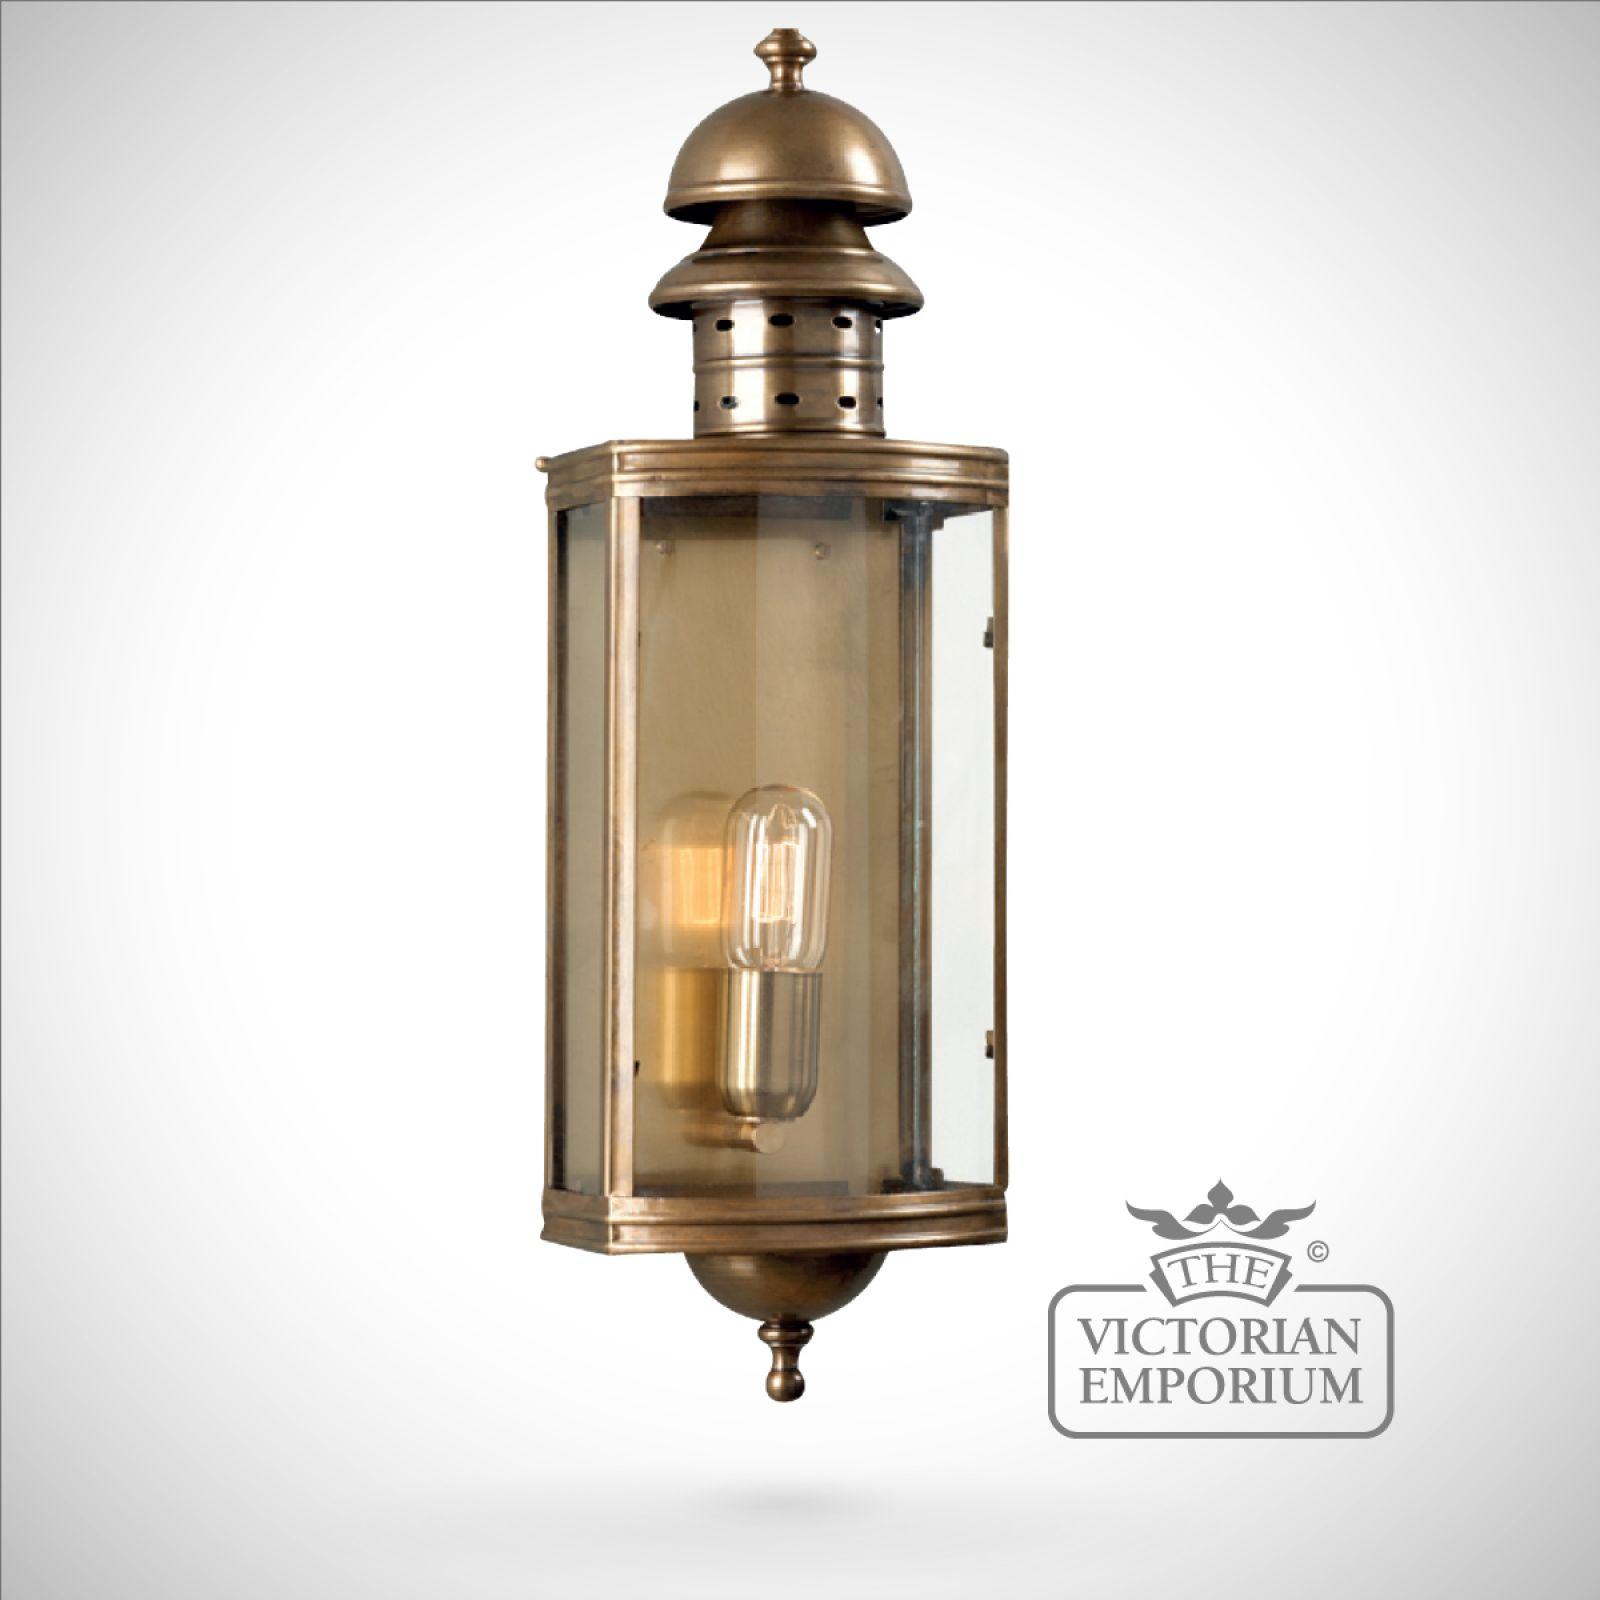 Downing Street Brass wall lantern - antique brass ...